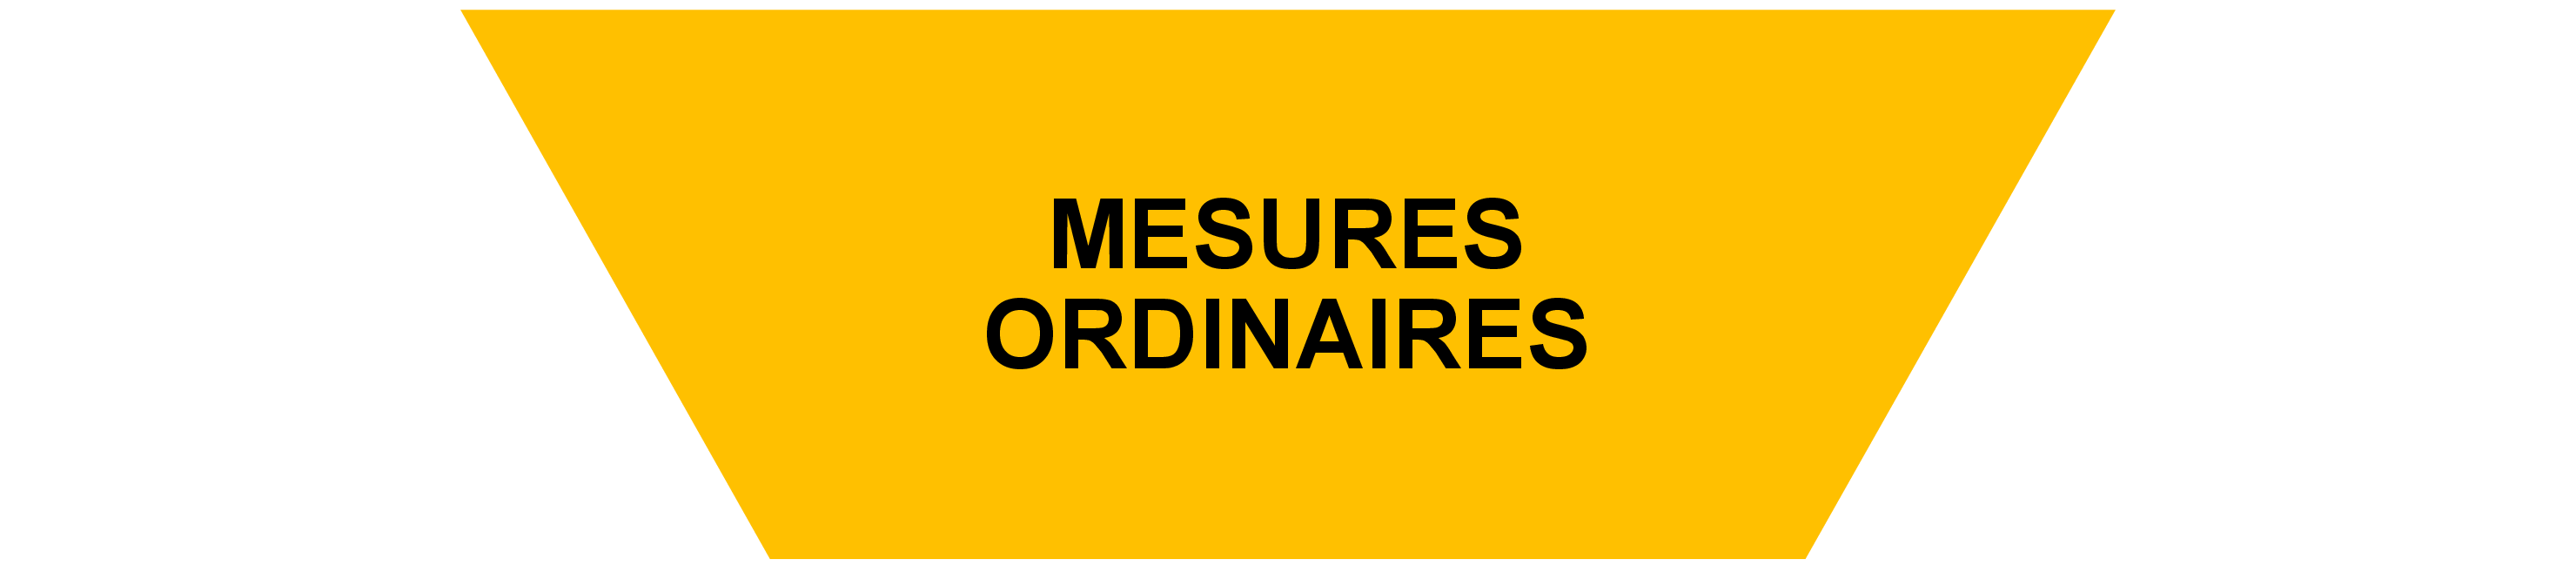 mesures-ordinaires